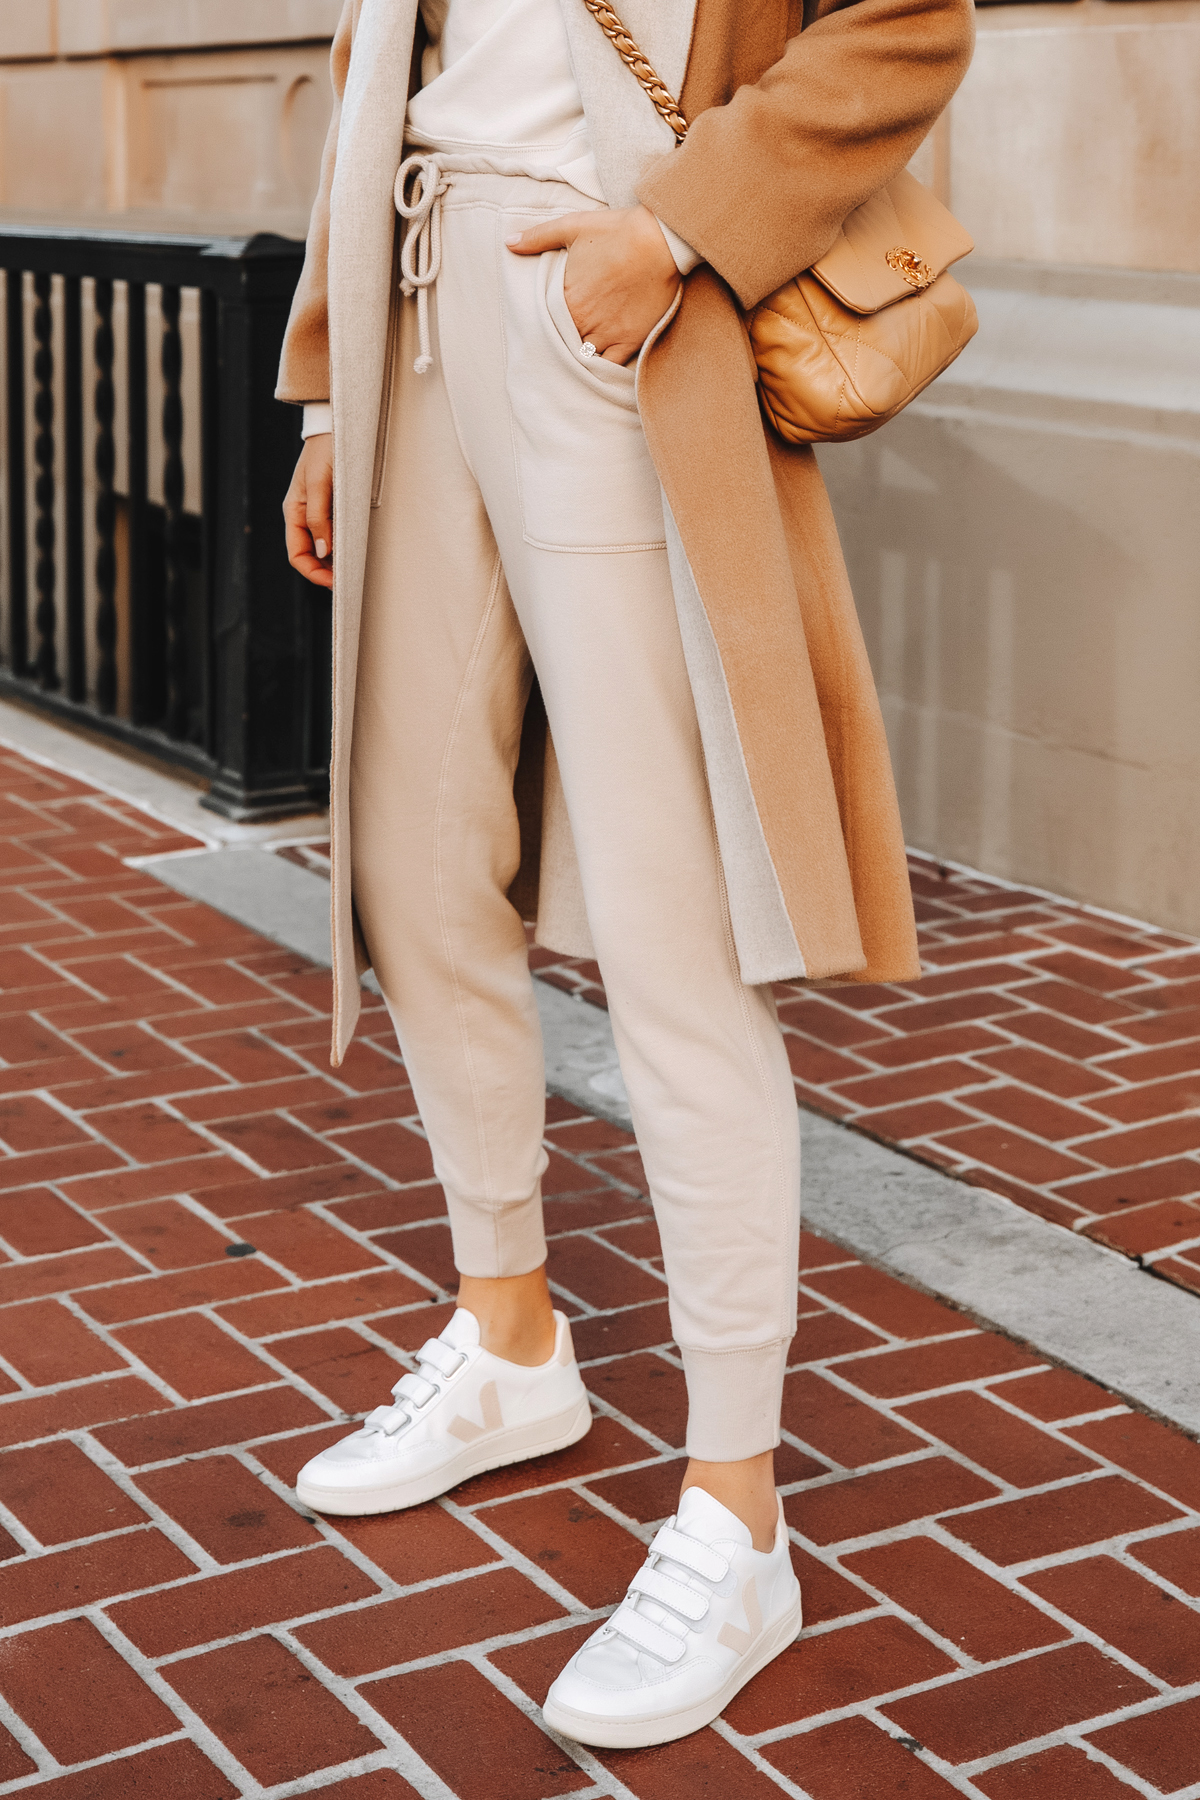 Fashion Jackson Wearing Beige Sweatpants Veja V-LOCK Sneakers